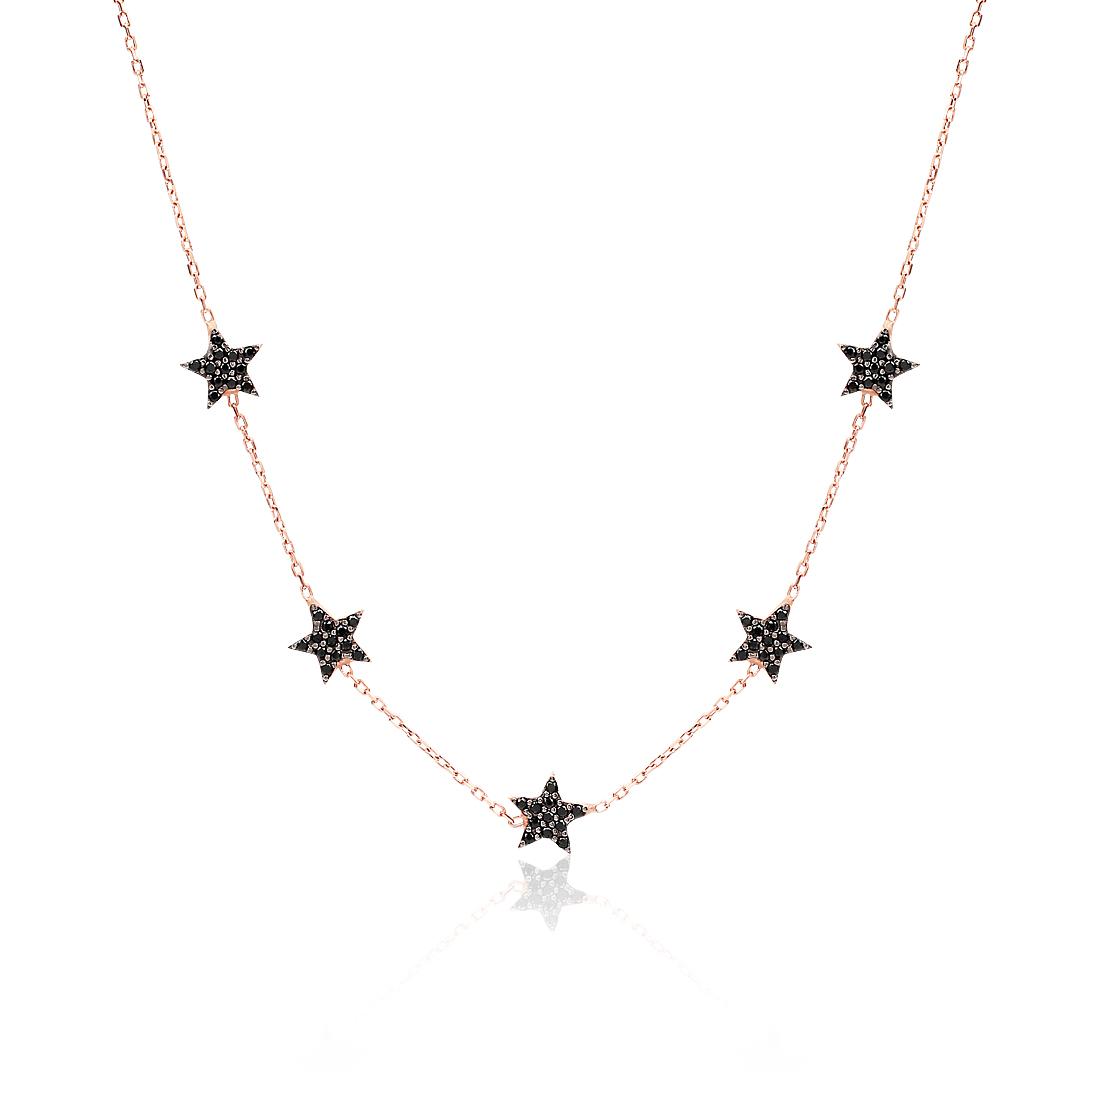 Five Stars Rose Black Necklace - High Street Jewelry